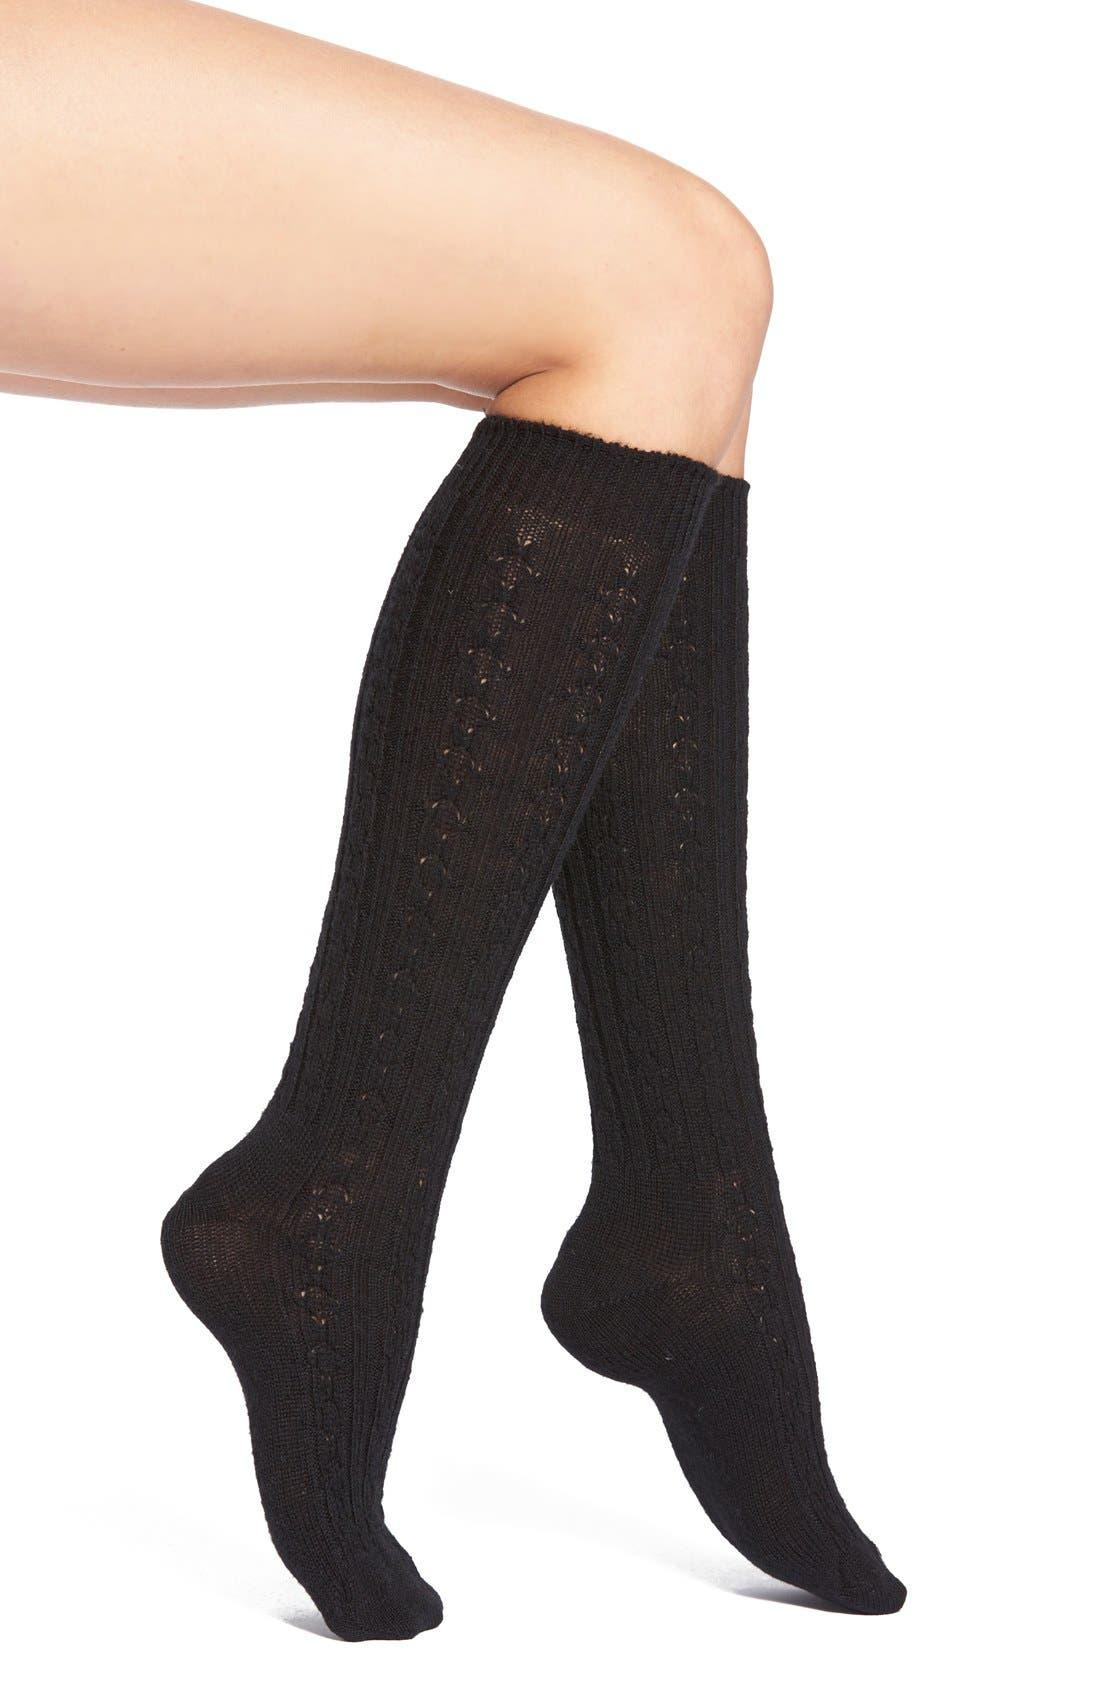 Cable Knit Knee Socks,                             Main thumbnail 1, color,